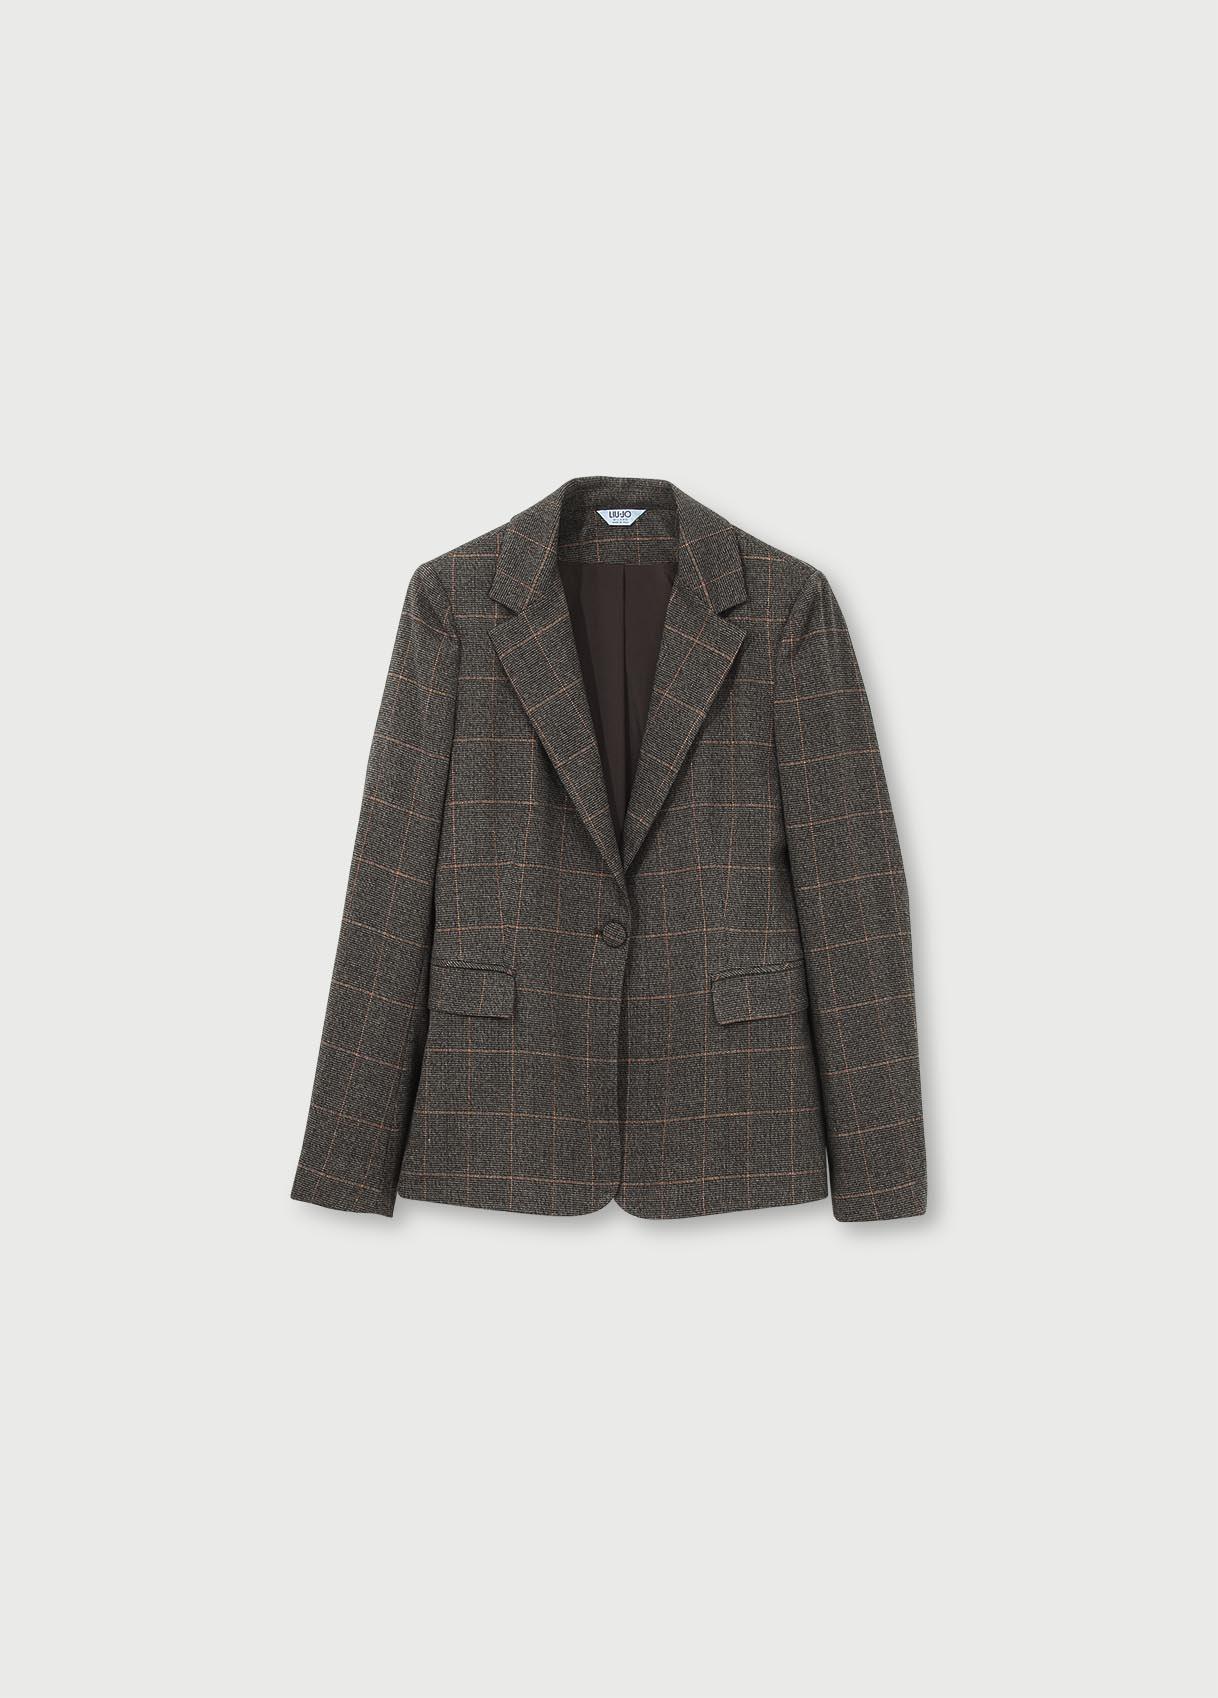 LIU JO blazer jacquard-1